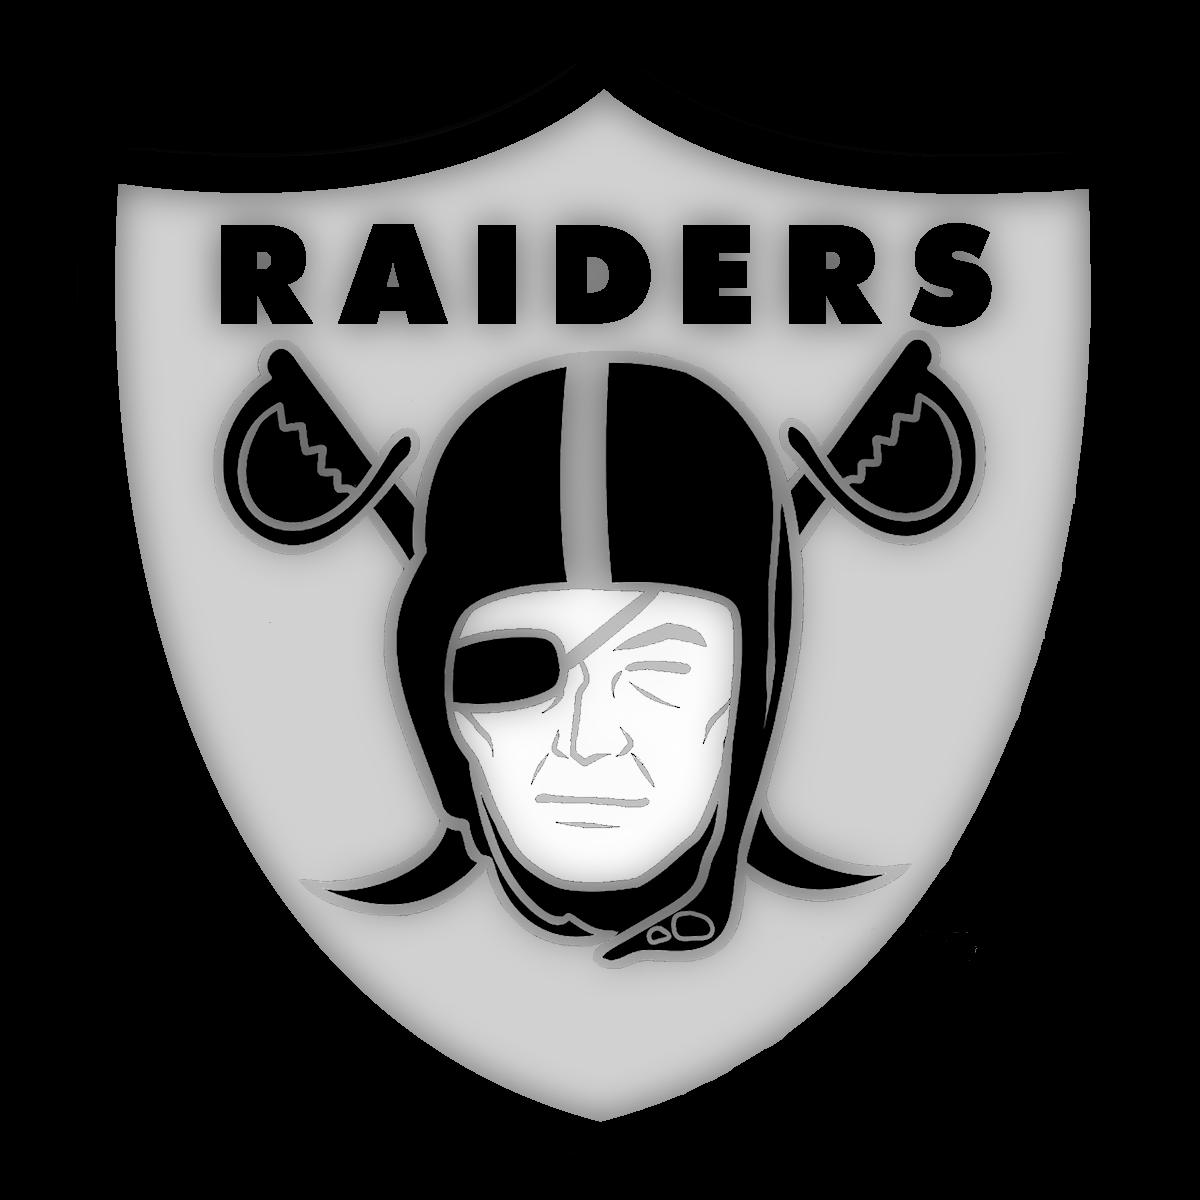 Oakland Raiders Logo Oakland raiders logo, Oakland